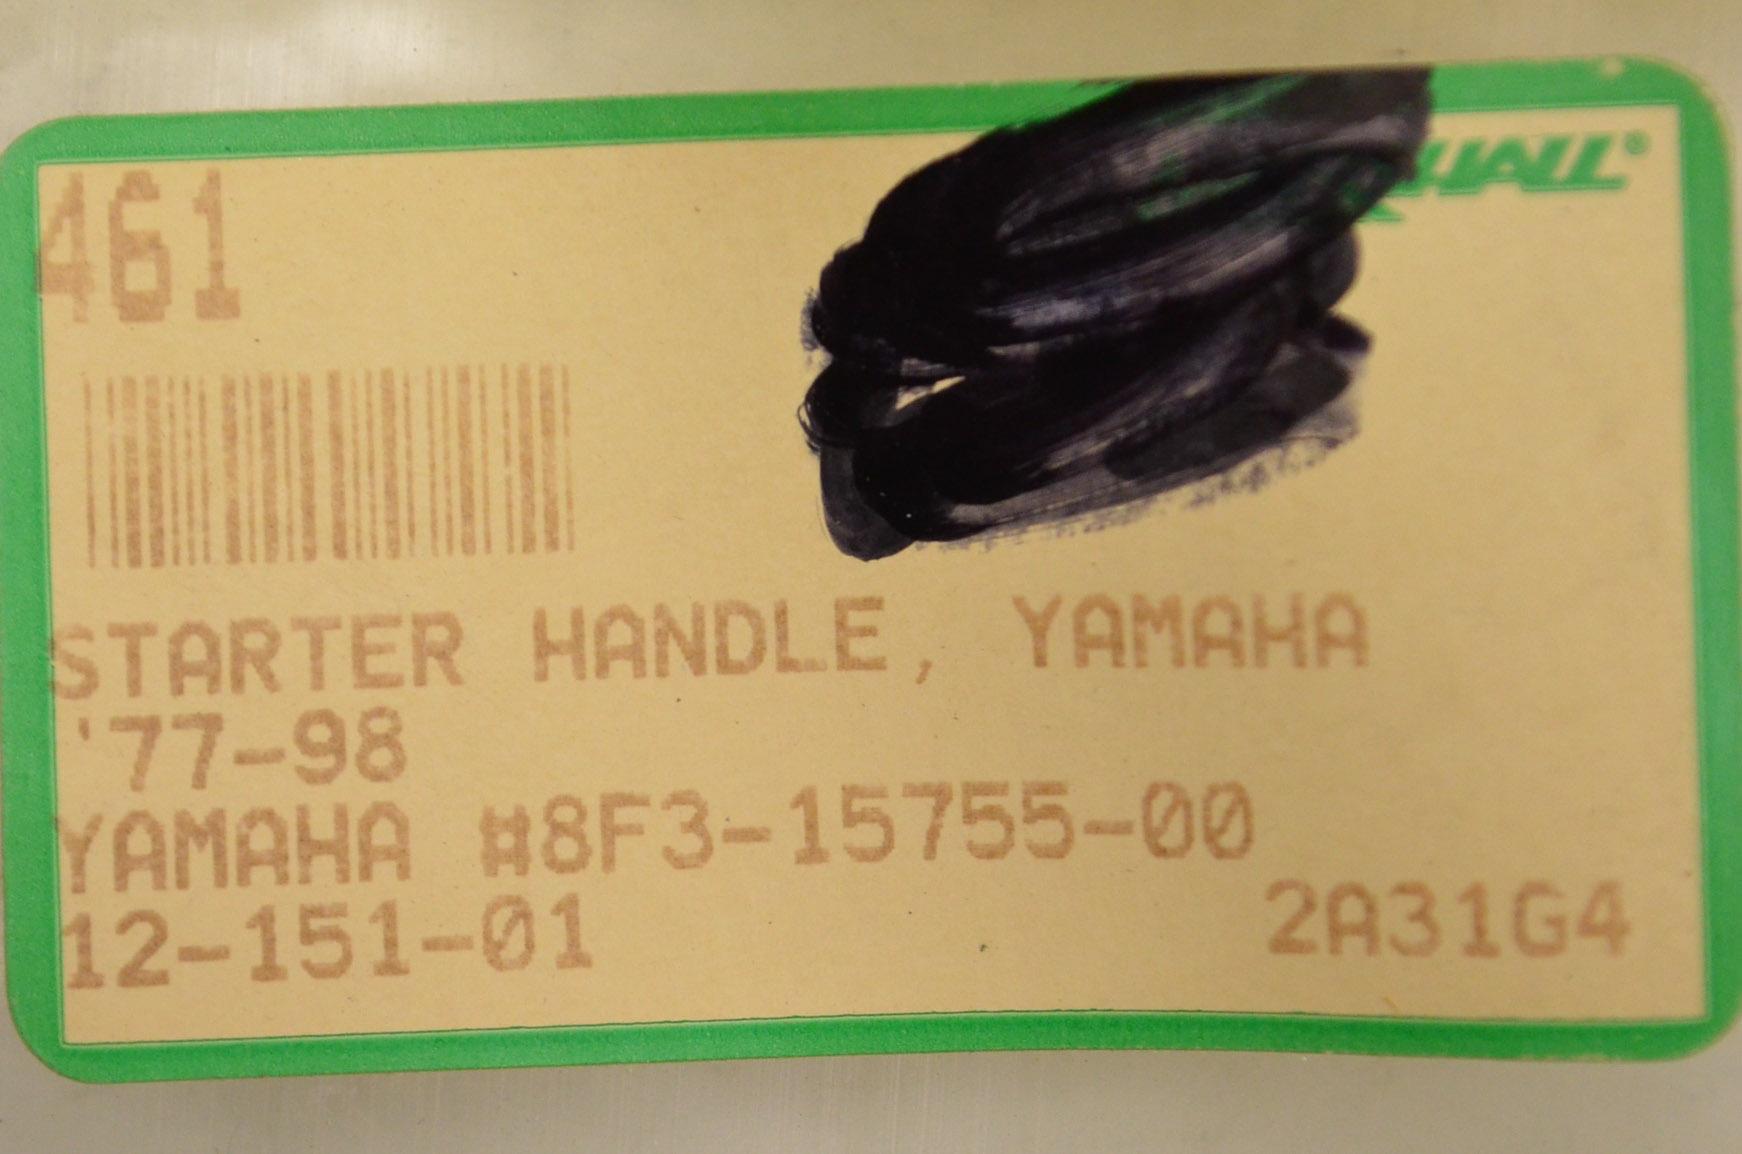 YAMAHA SNOWMOBILE STARTER HANDLE  12-151-01